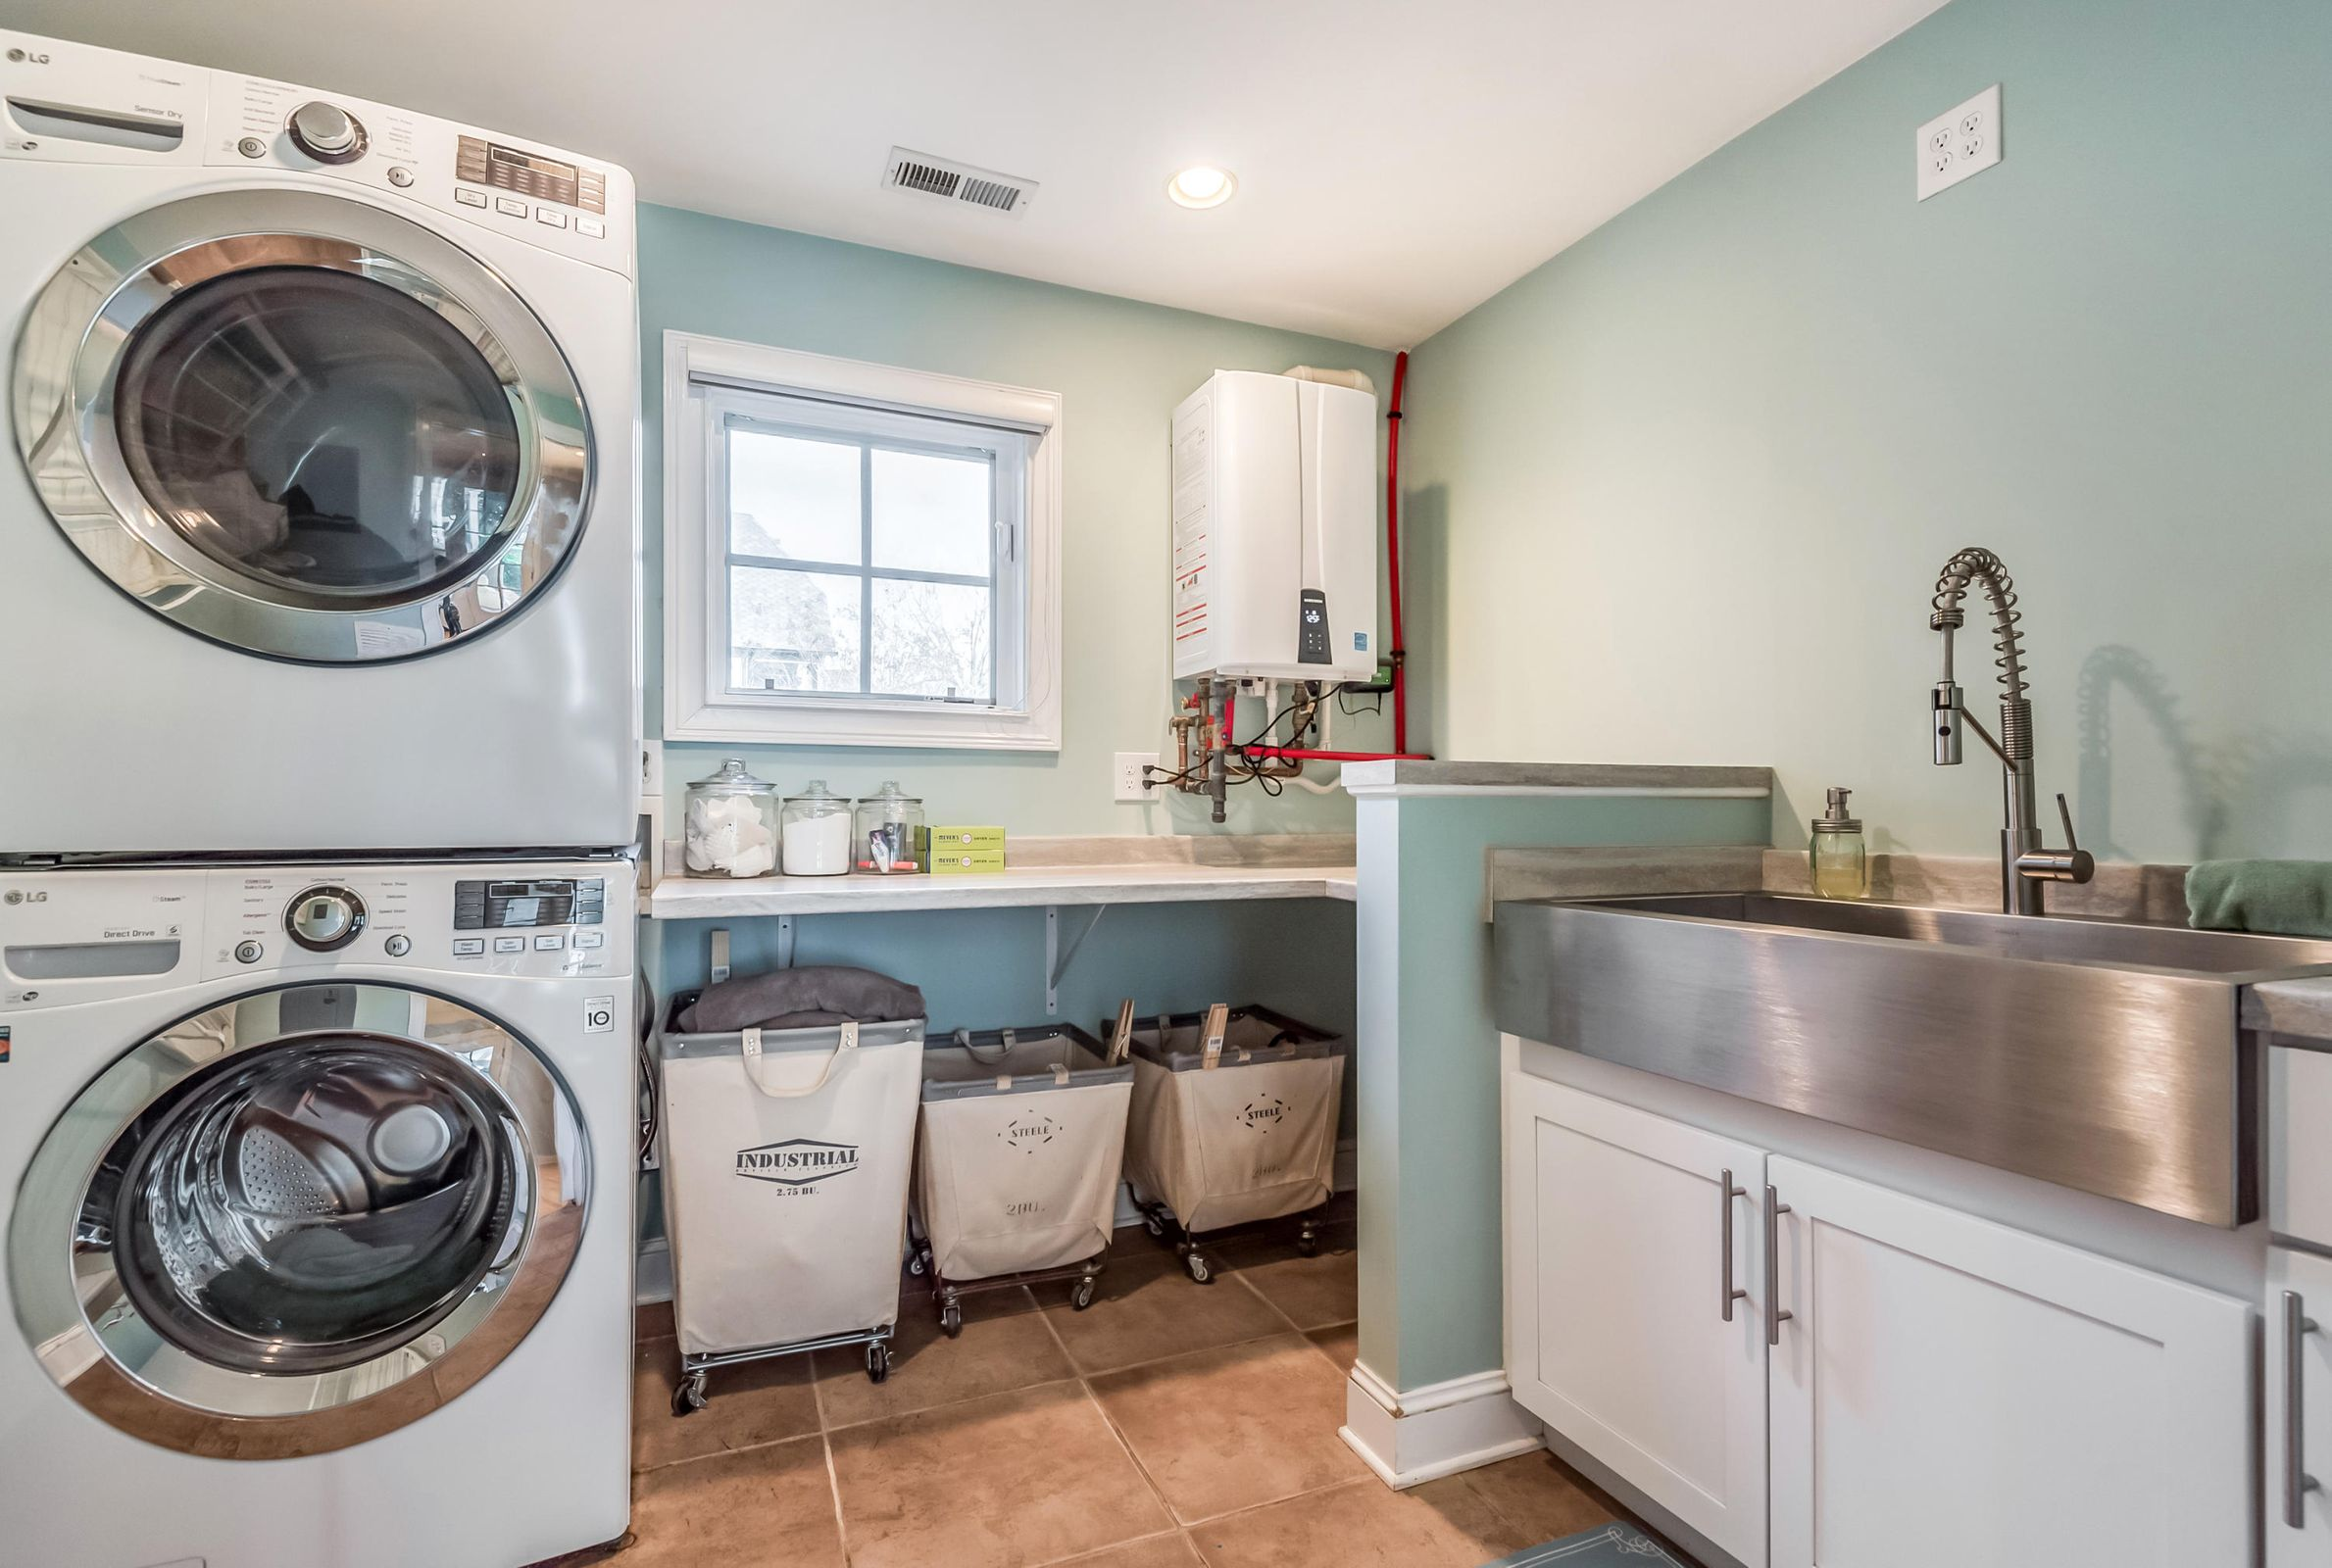 6612StoneMill-Laundry